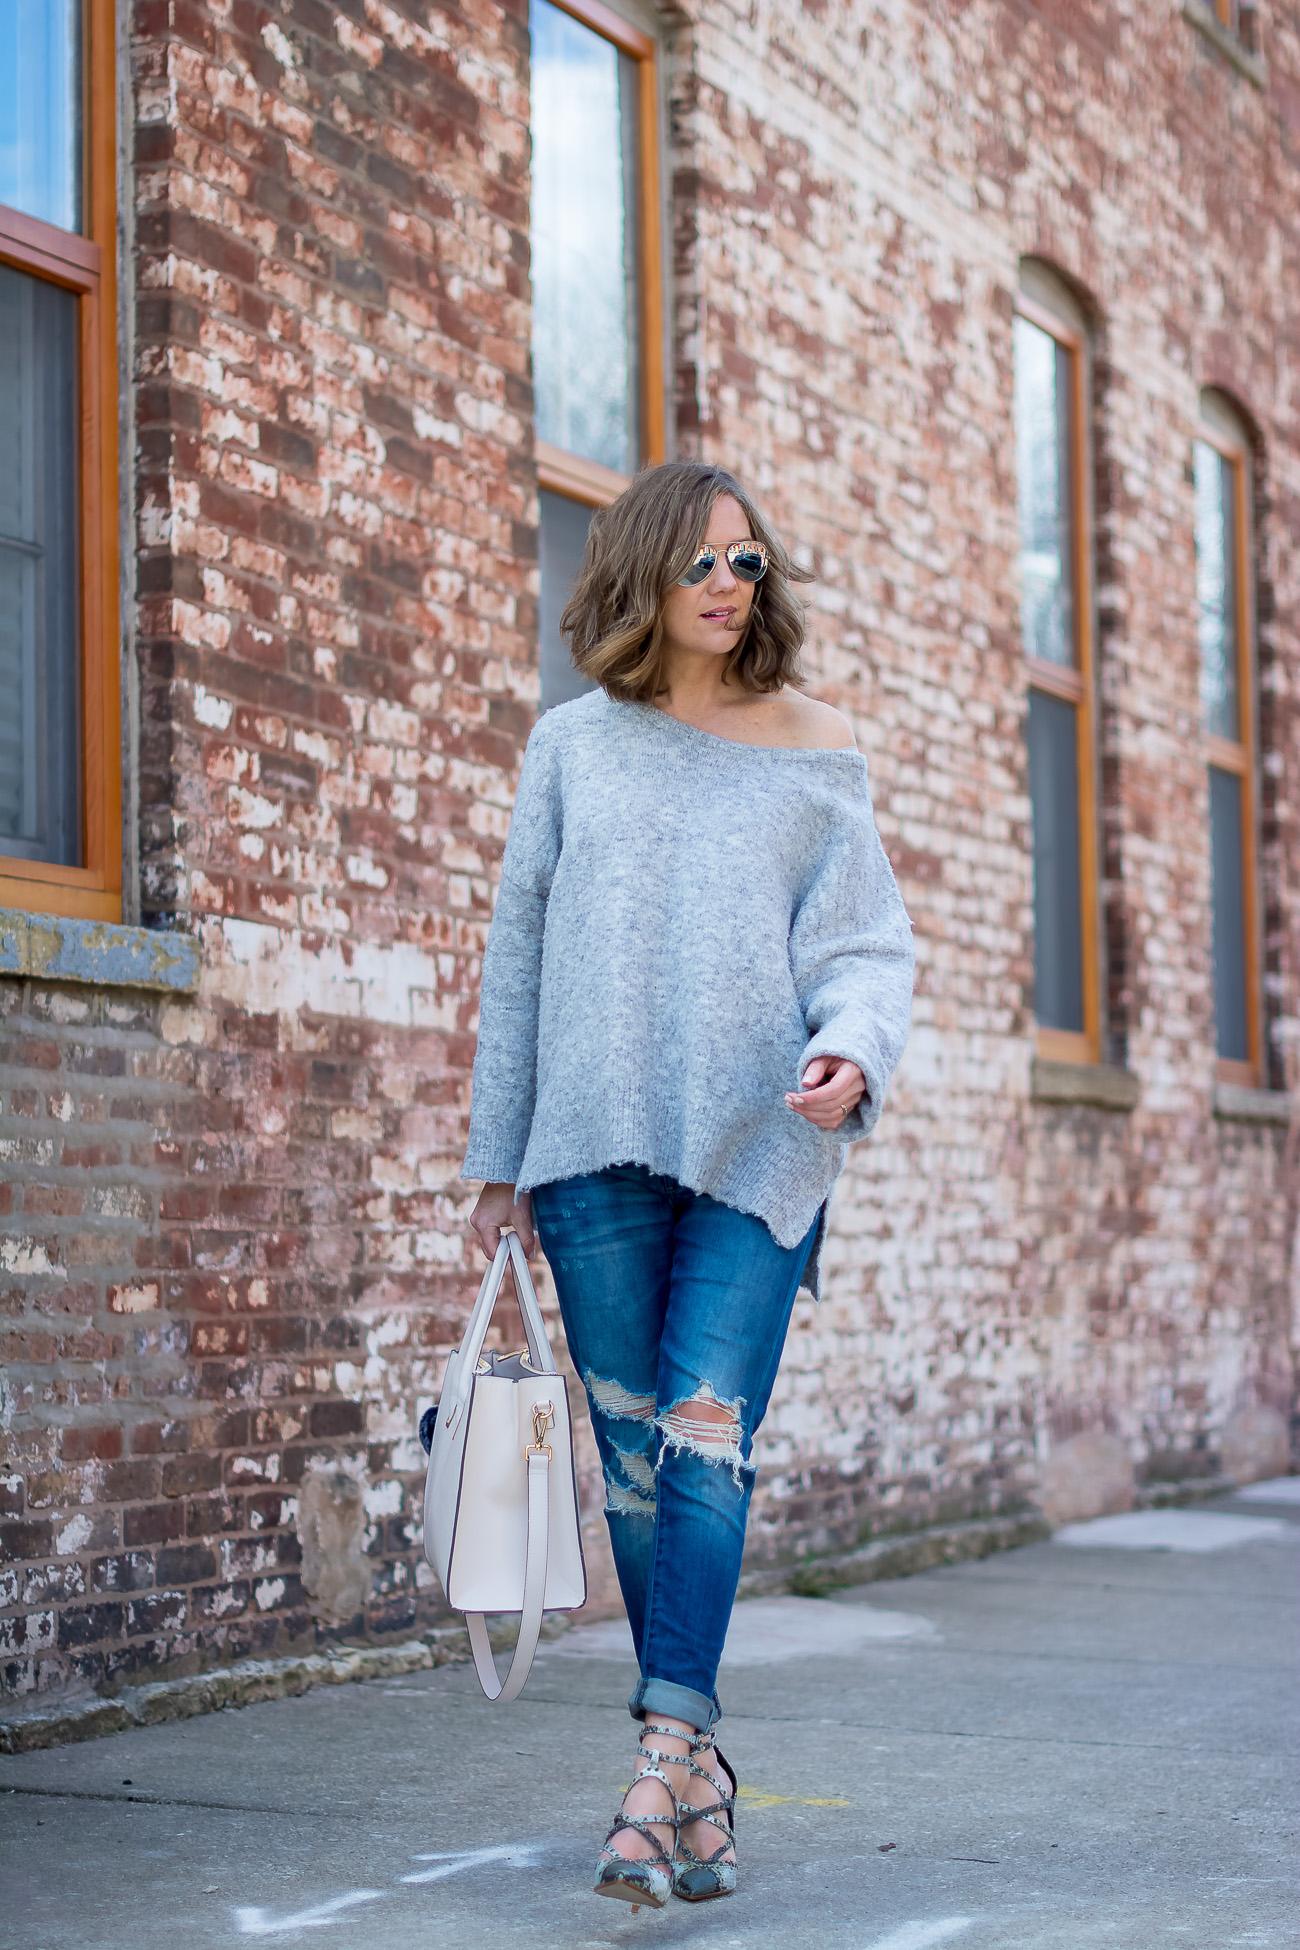 grey-off-the-shoulder-sweater-boyfriend-jeans-snakeskin-heels-blush-satchel-8